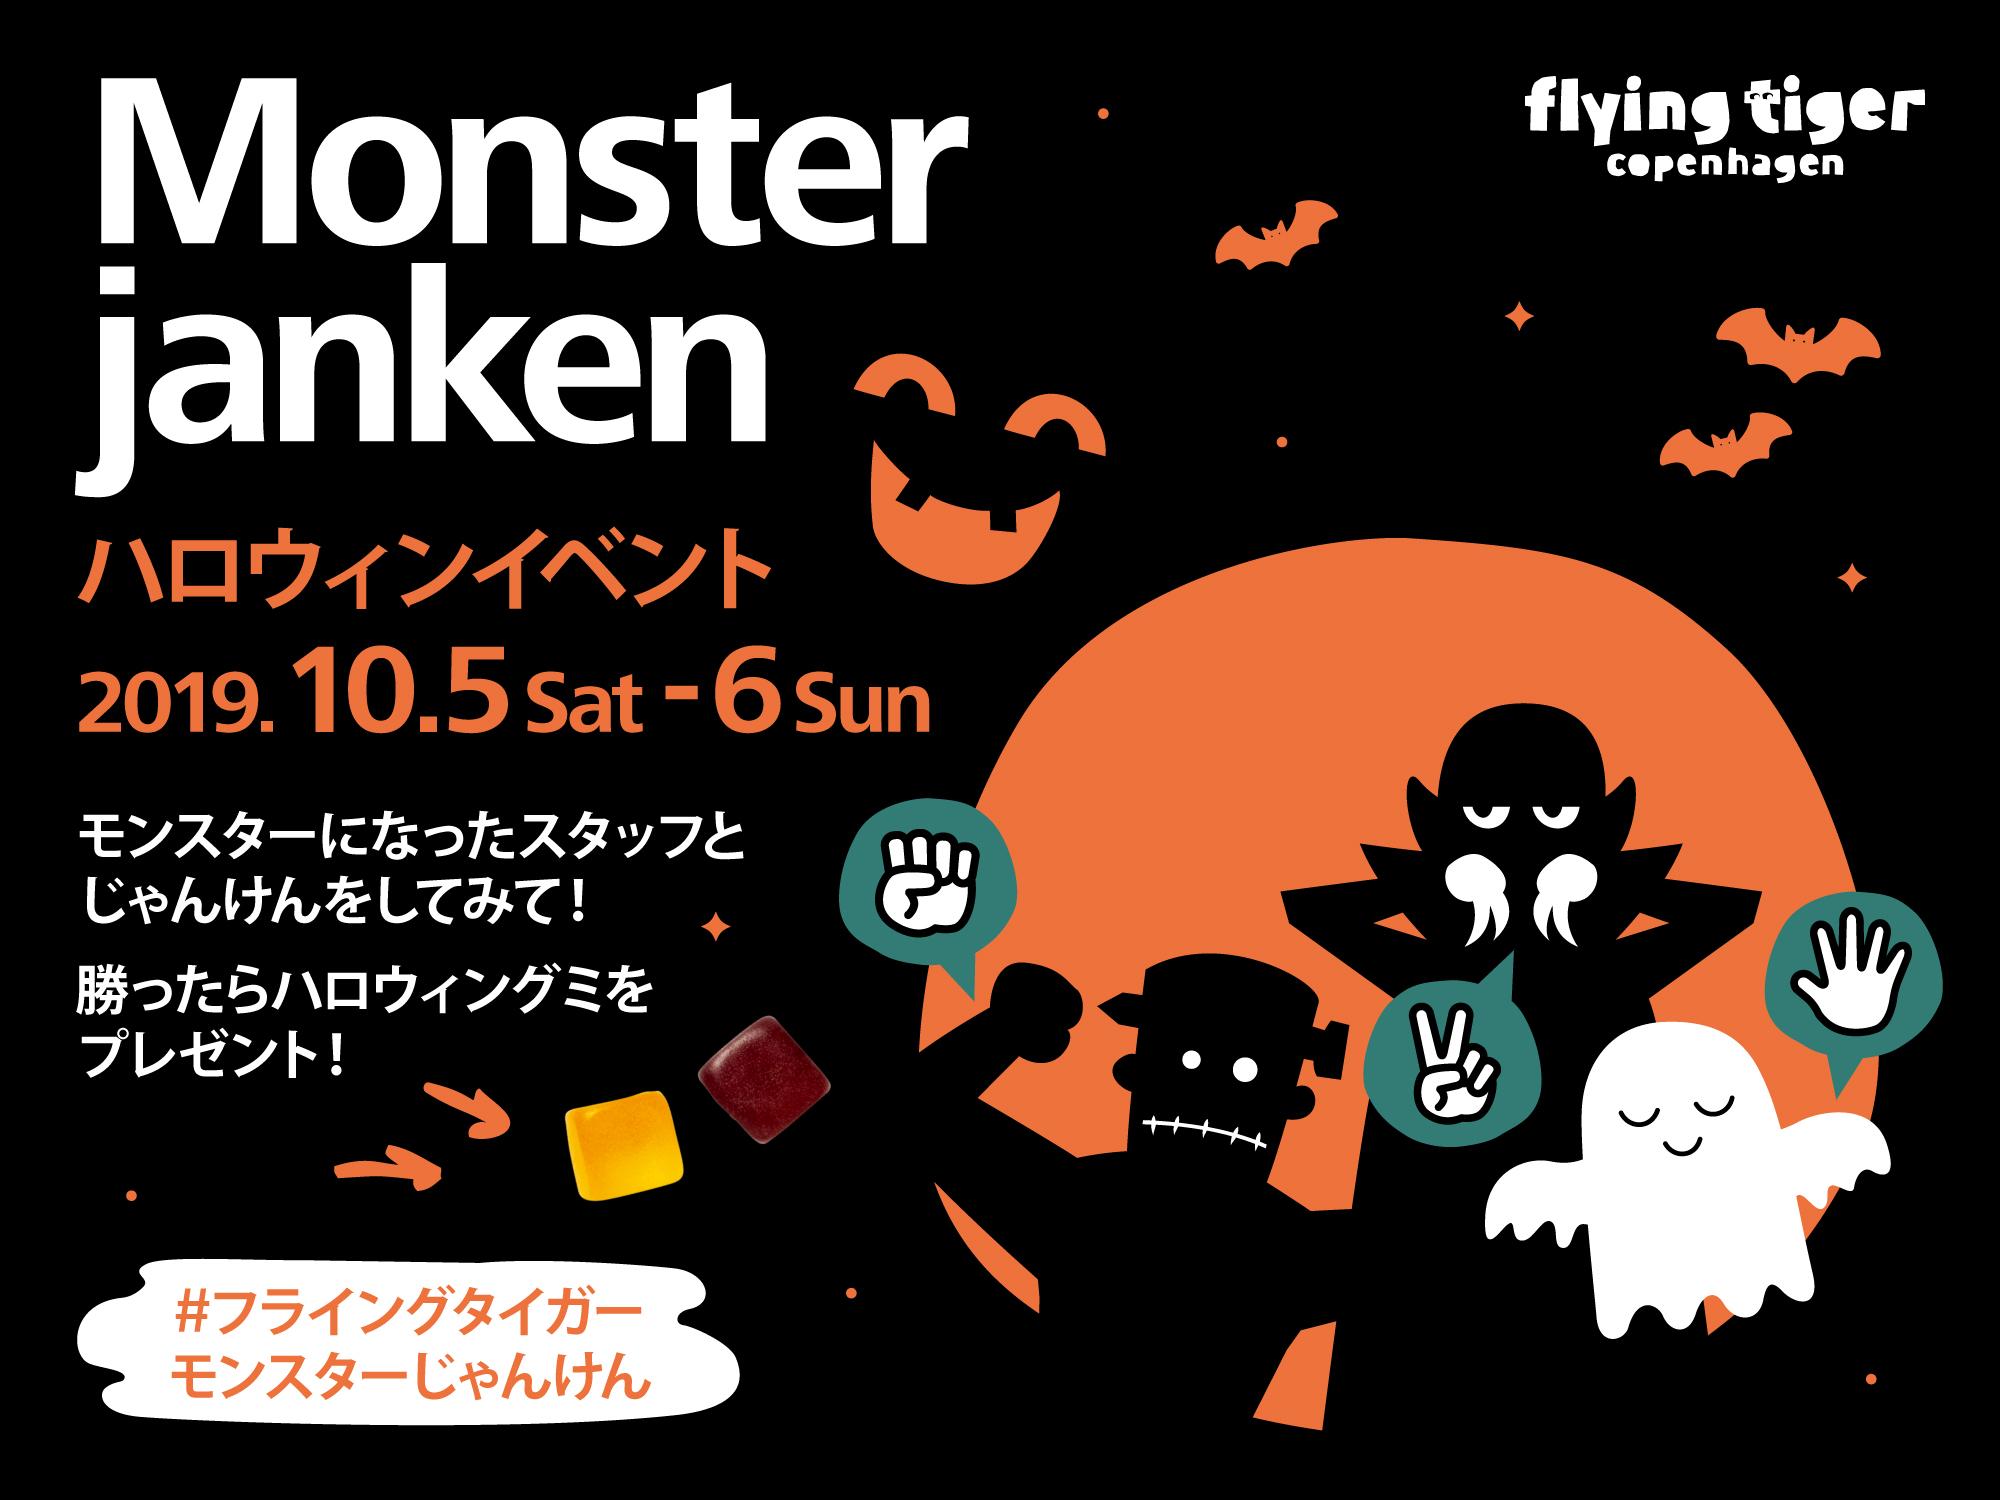 Monster janken